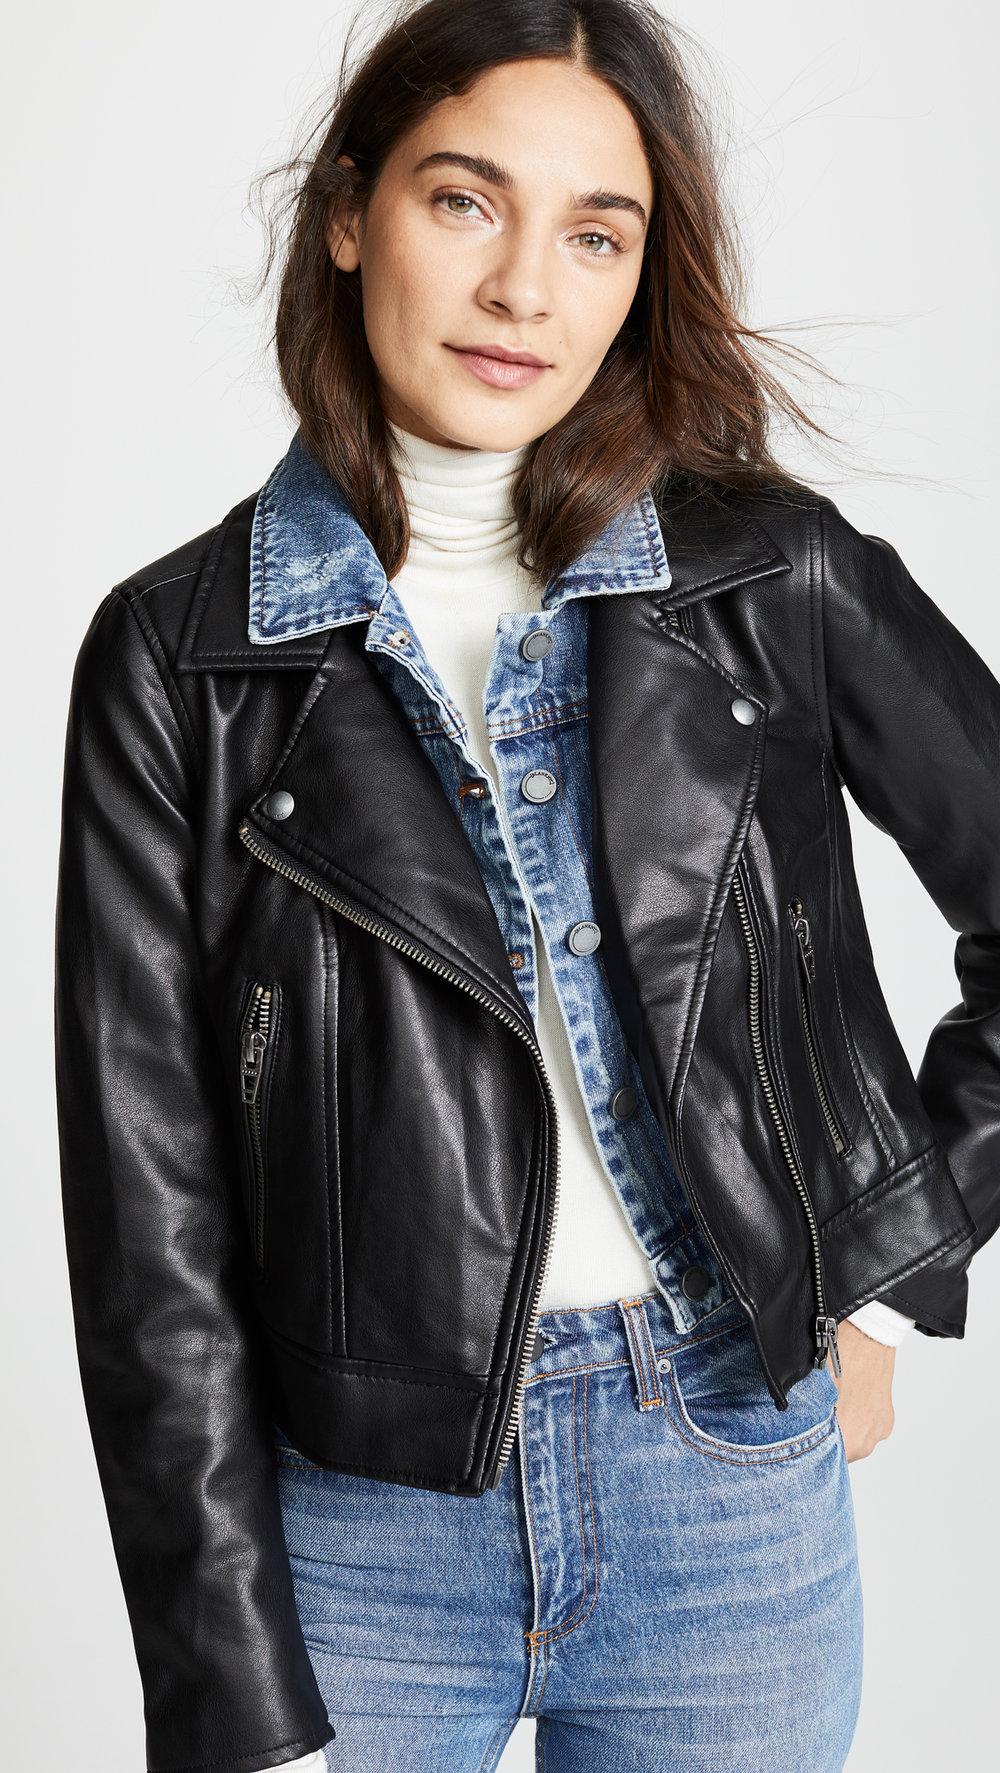 Black DenimDouble layer Denim/Leather jacket - Was: $128.00Now: $76.80